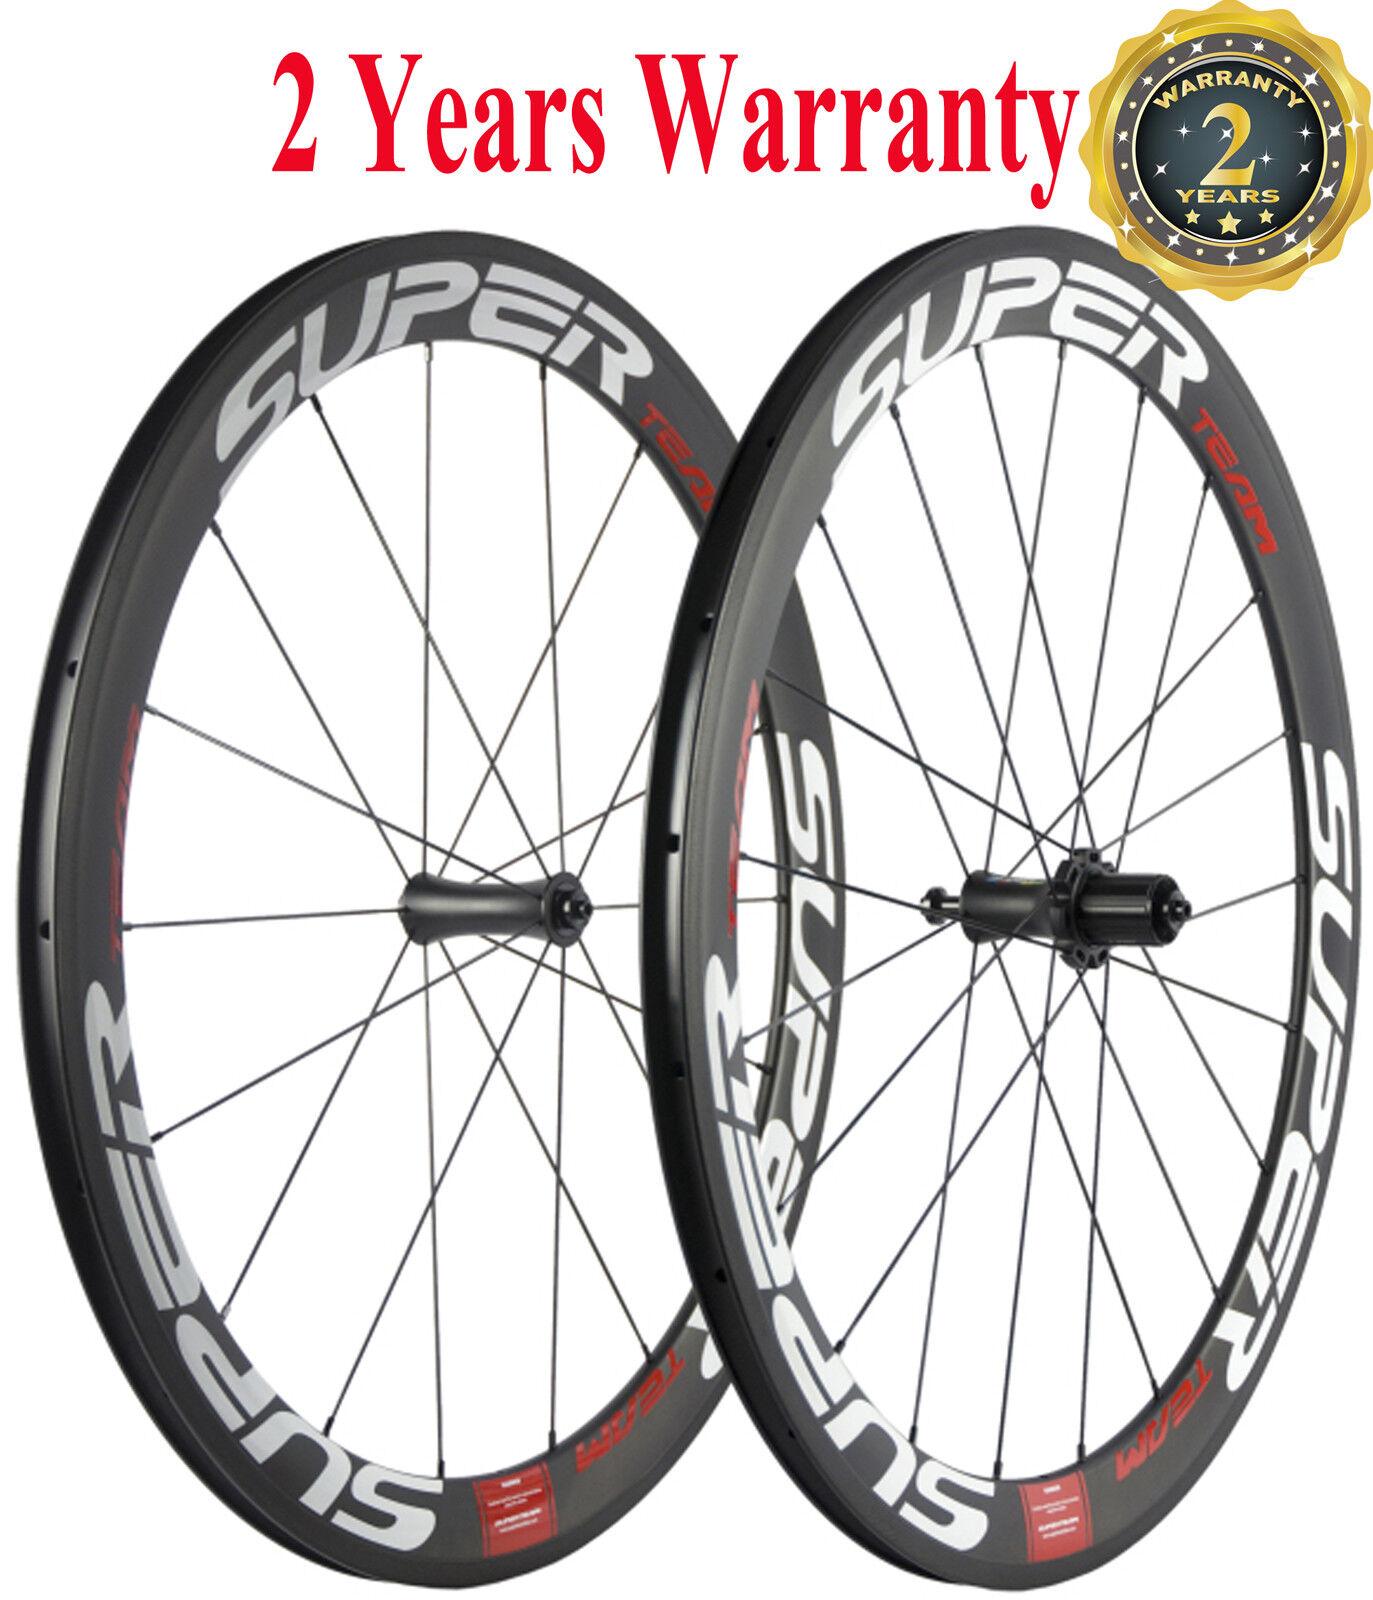 Superteam 50mm Clincher Carbon  Bike Wheels 700C Bicycle Wheelset R7 Hub Racing  cheap designer brands